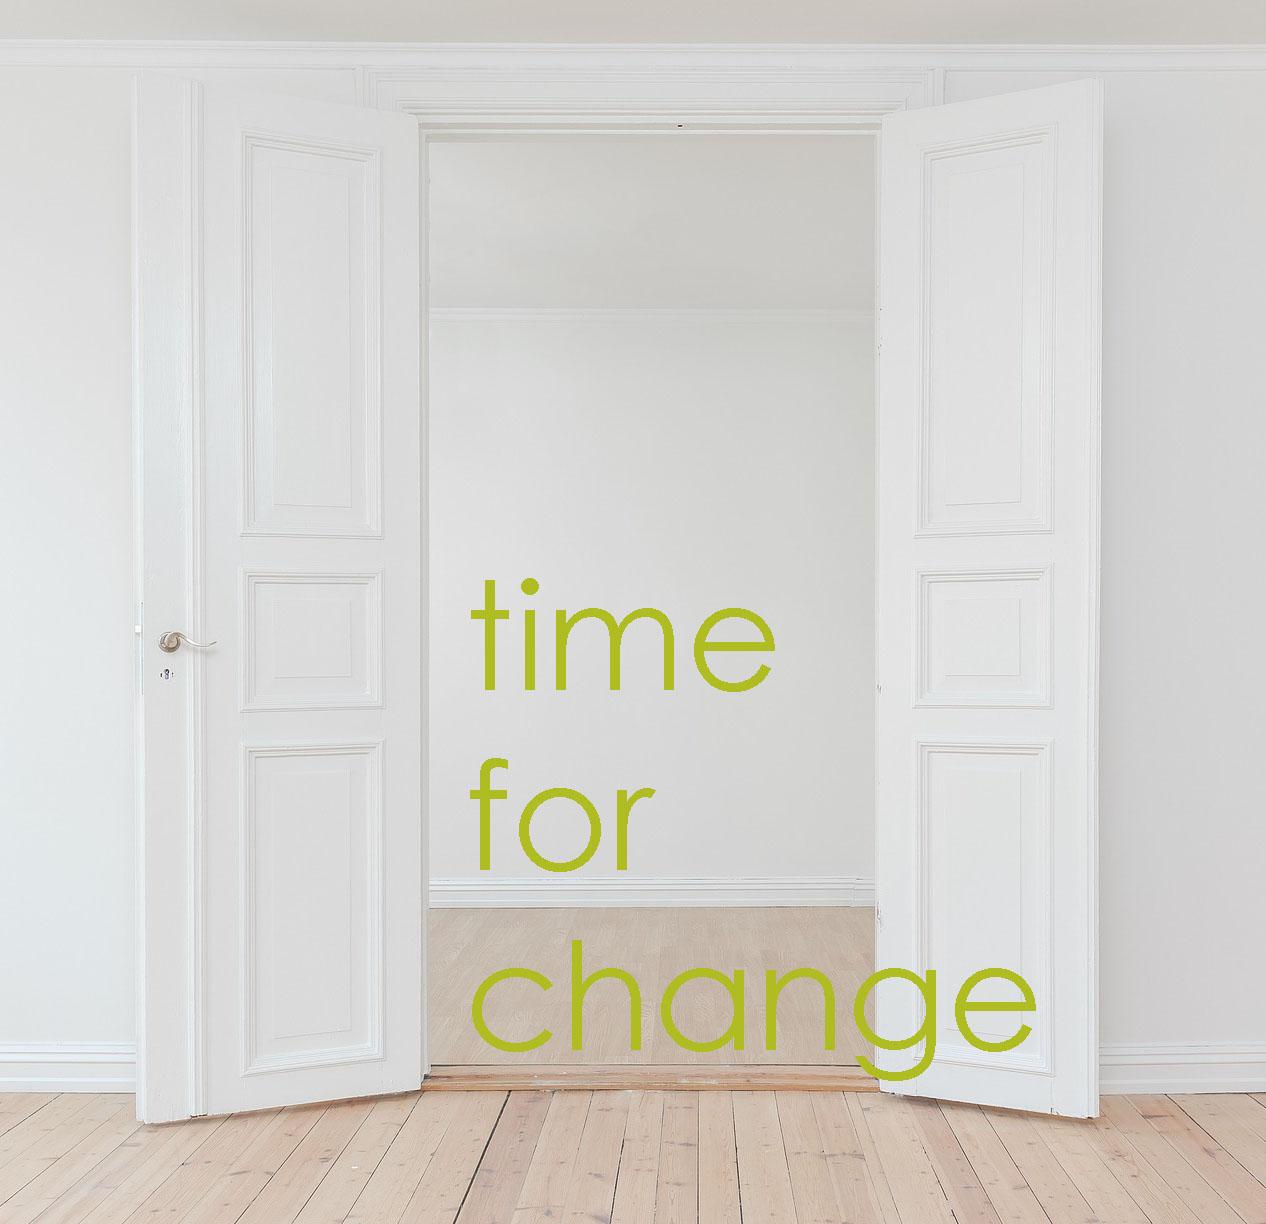 #kinesiologiepraxismuenchen #change #timeforchange #wandel #harras #sendling #psychotherapie #coaching